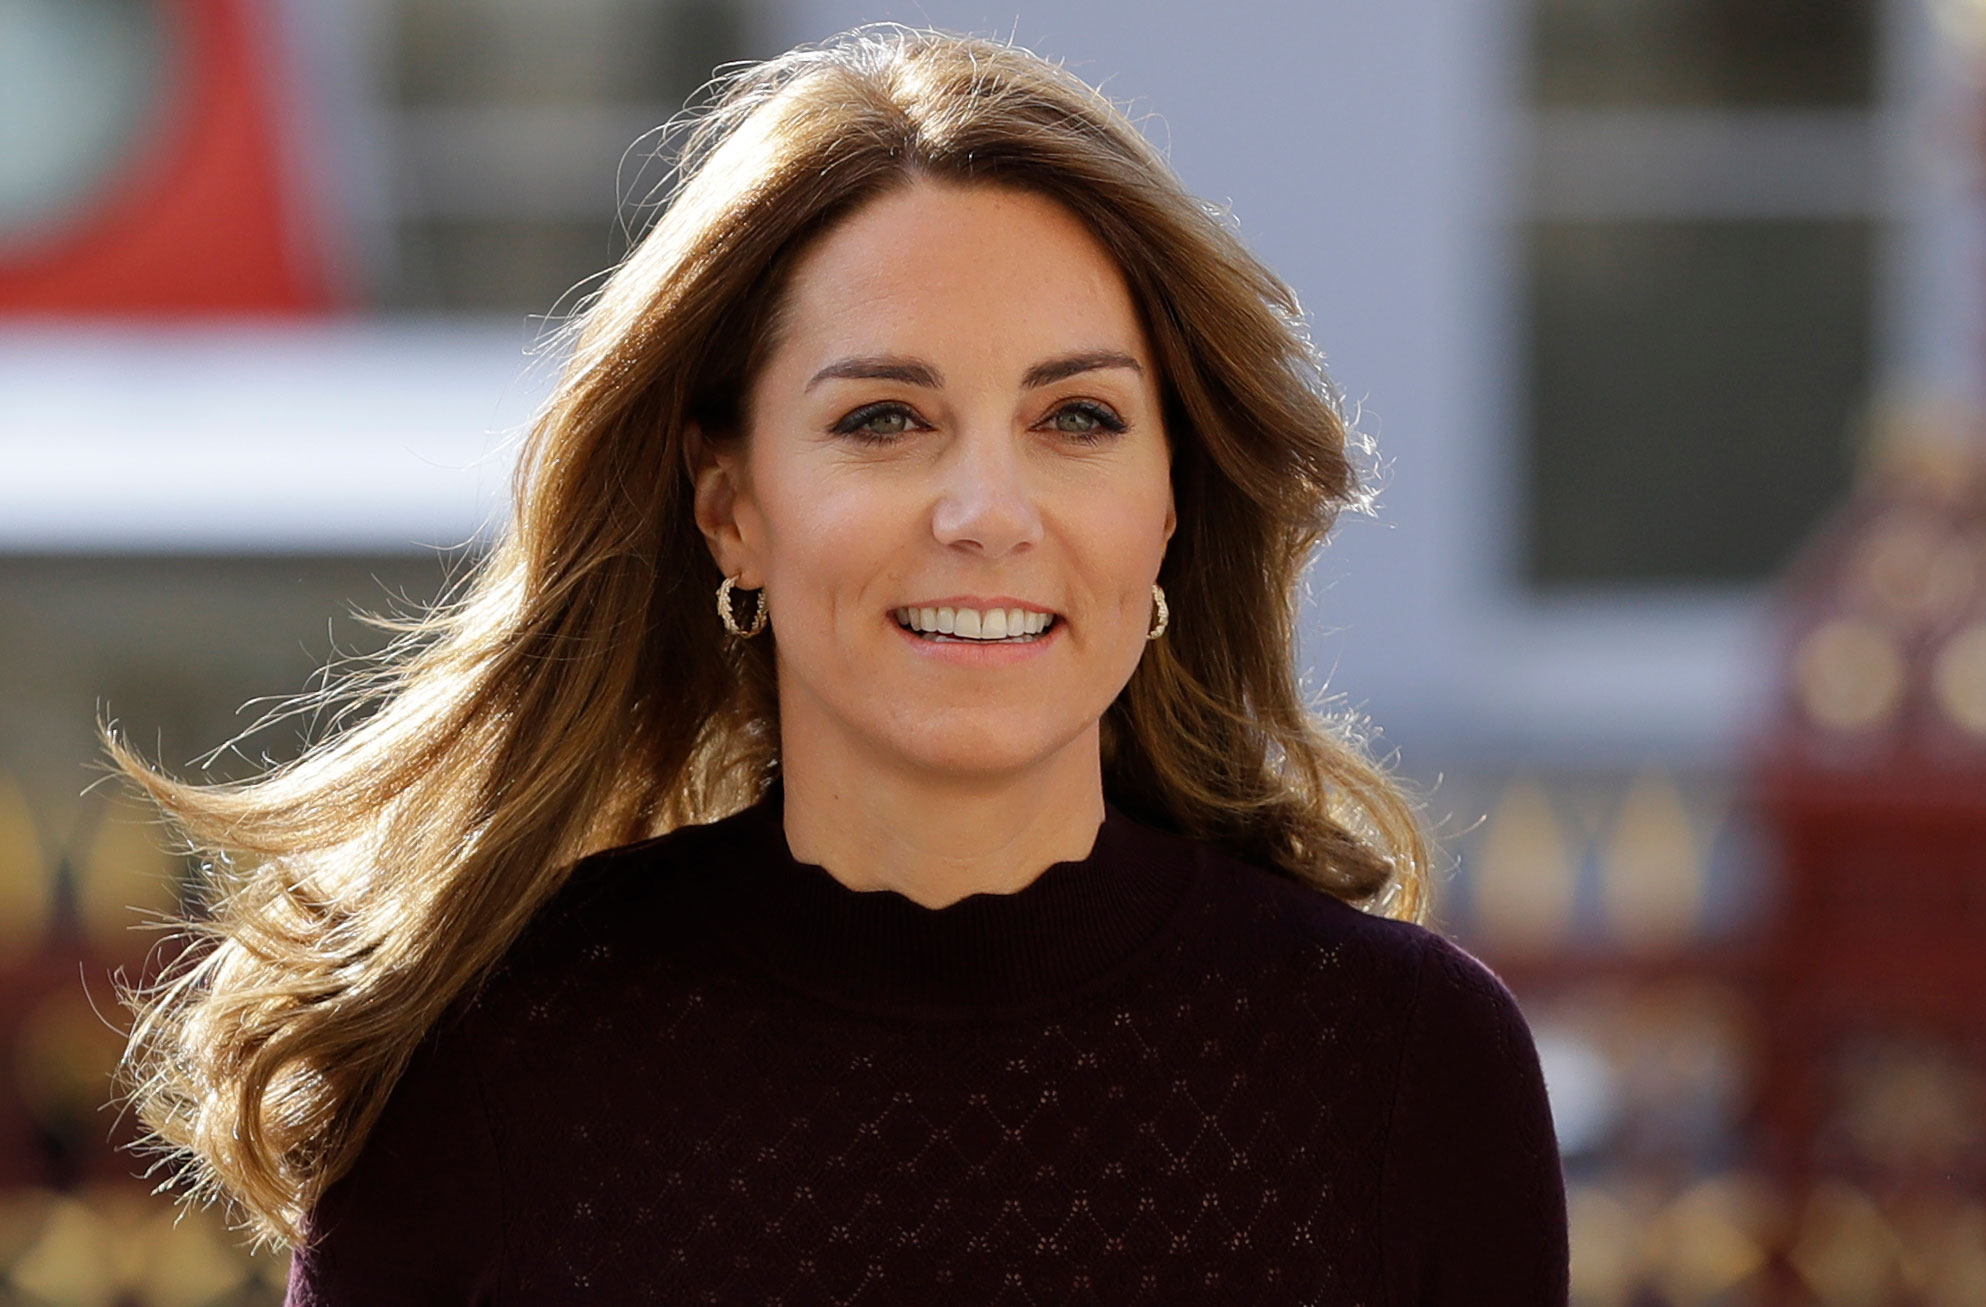 Duchess Cambridge